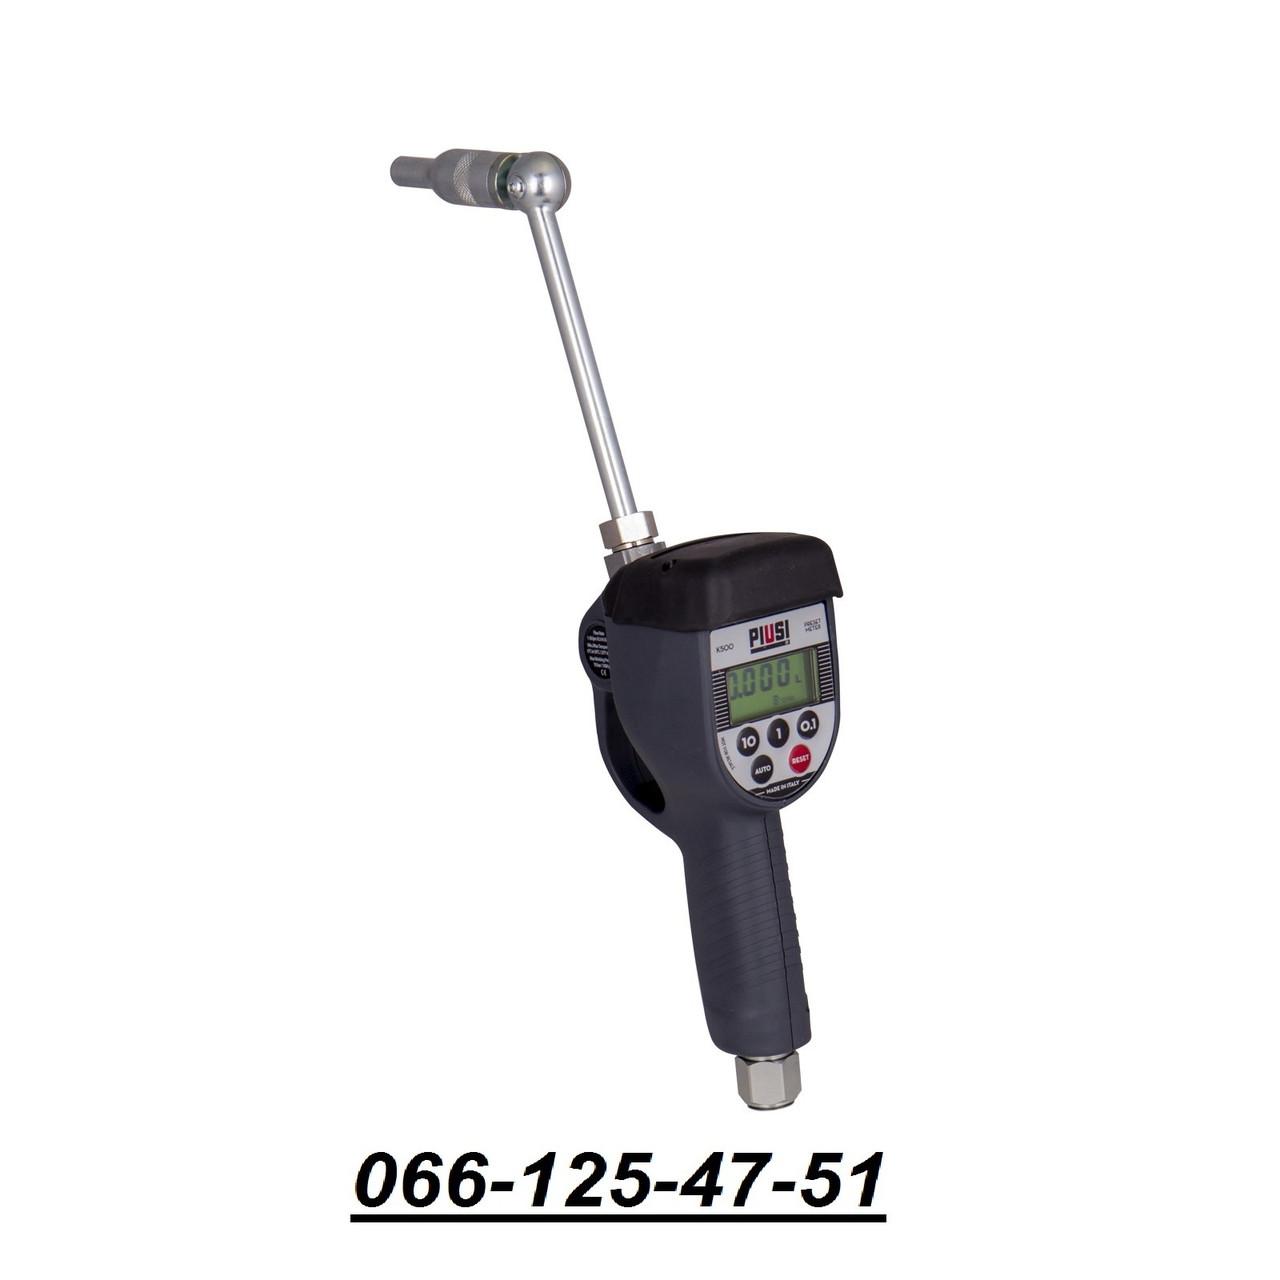 Дозирующий пистолет для раздачи масла PIUSI K500 W/ARTICULABLE (F0068700D)